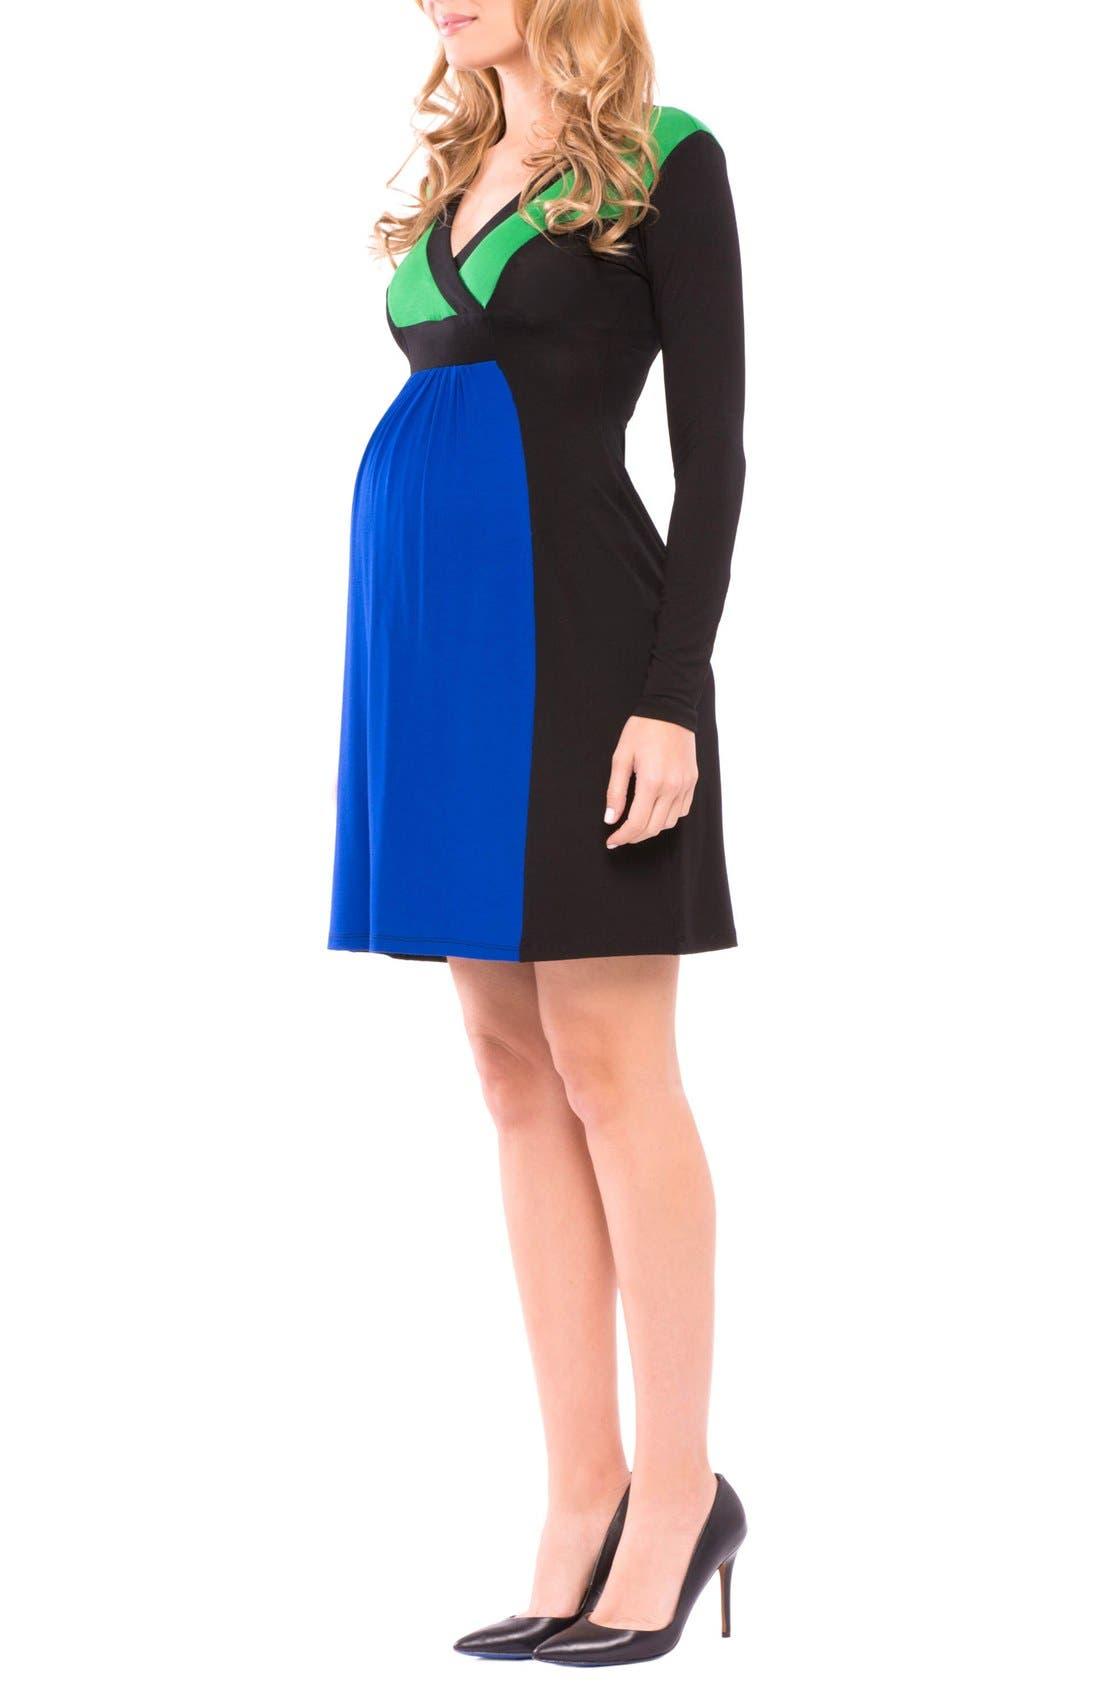 Margaret Maternity Dress,                             Alternate thumbnail 2, color,                             True Blue/ Grey/ Black